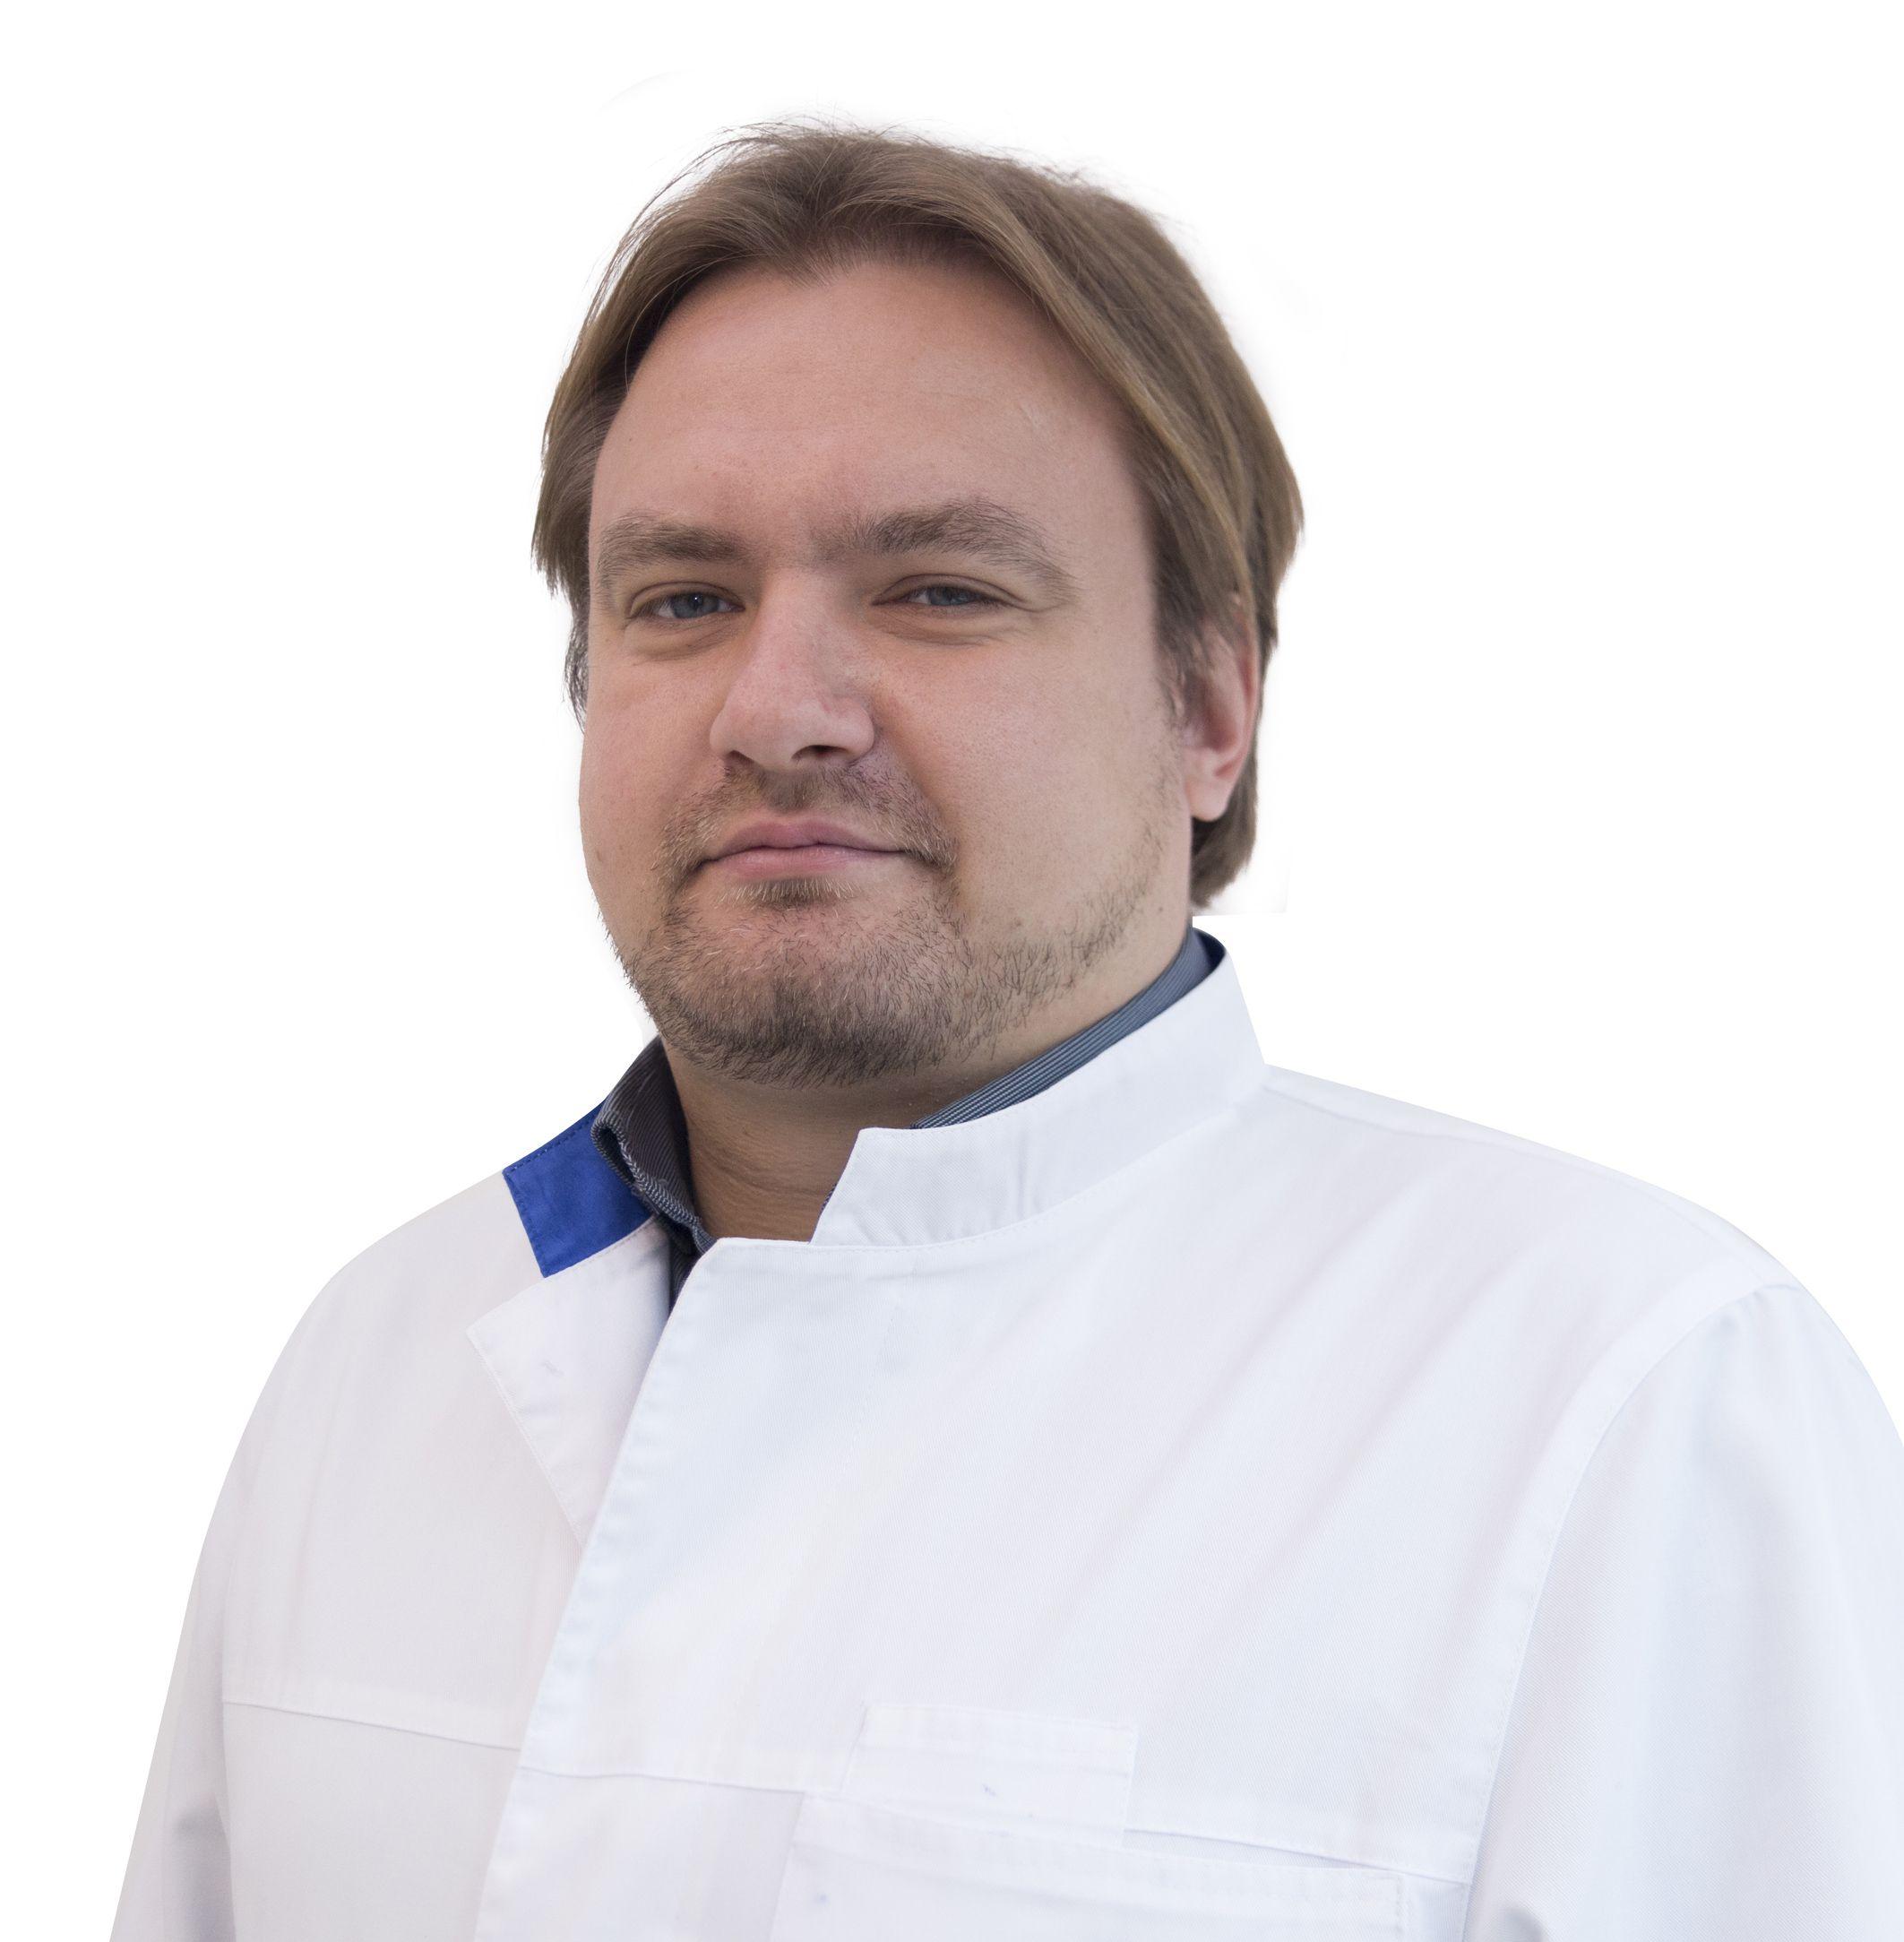 Шафаренко Алексей, Врач-психиатр, клиника ЕМС Москва